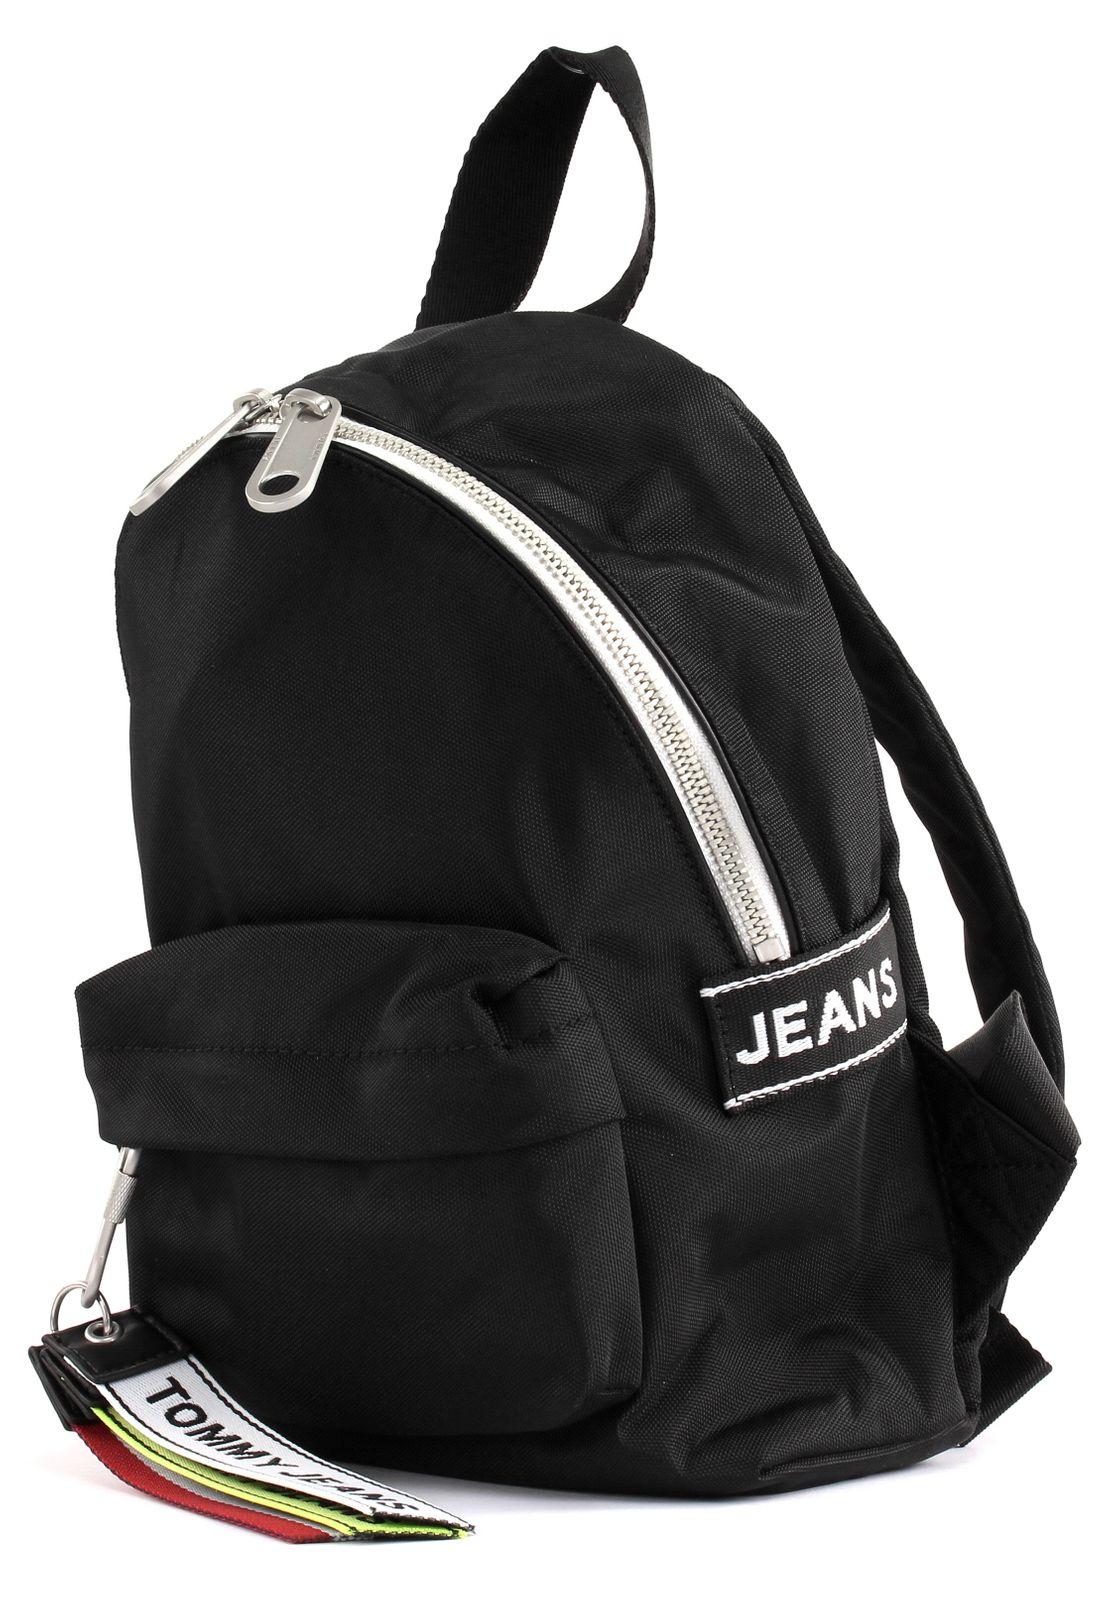 62f9a17e6f ... CloseTOMMY HILFIGER TJU Logo Tape Micro Backpack BlackTap To CloseNur  möglich bei sofortigem Zahlungseingang mit Paypal